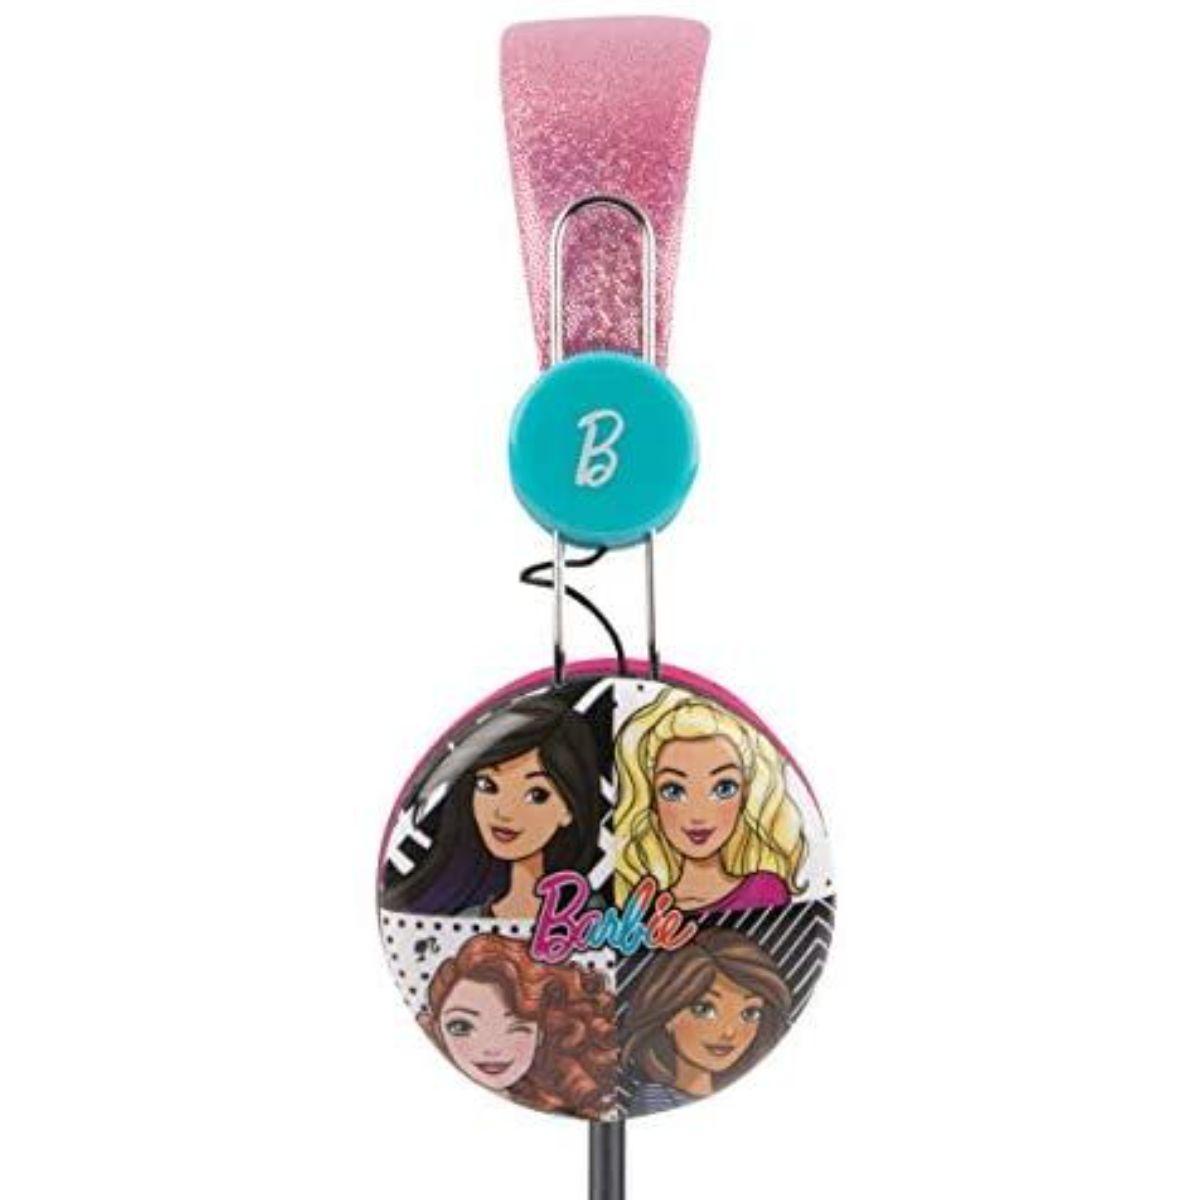 audifonos barbie 3 1 1